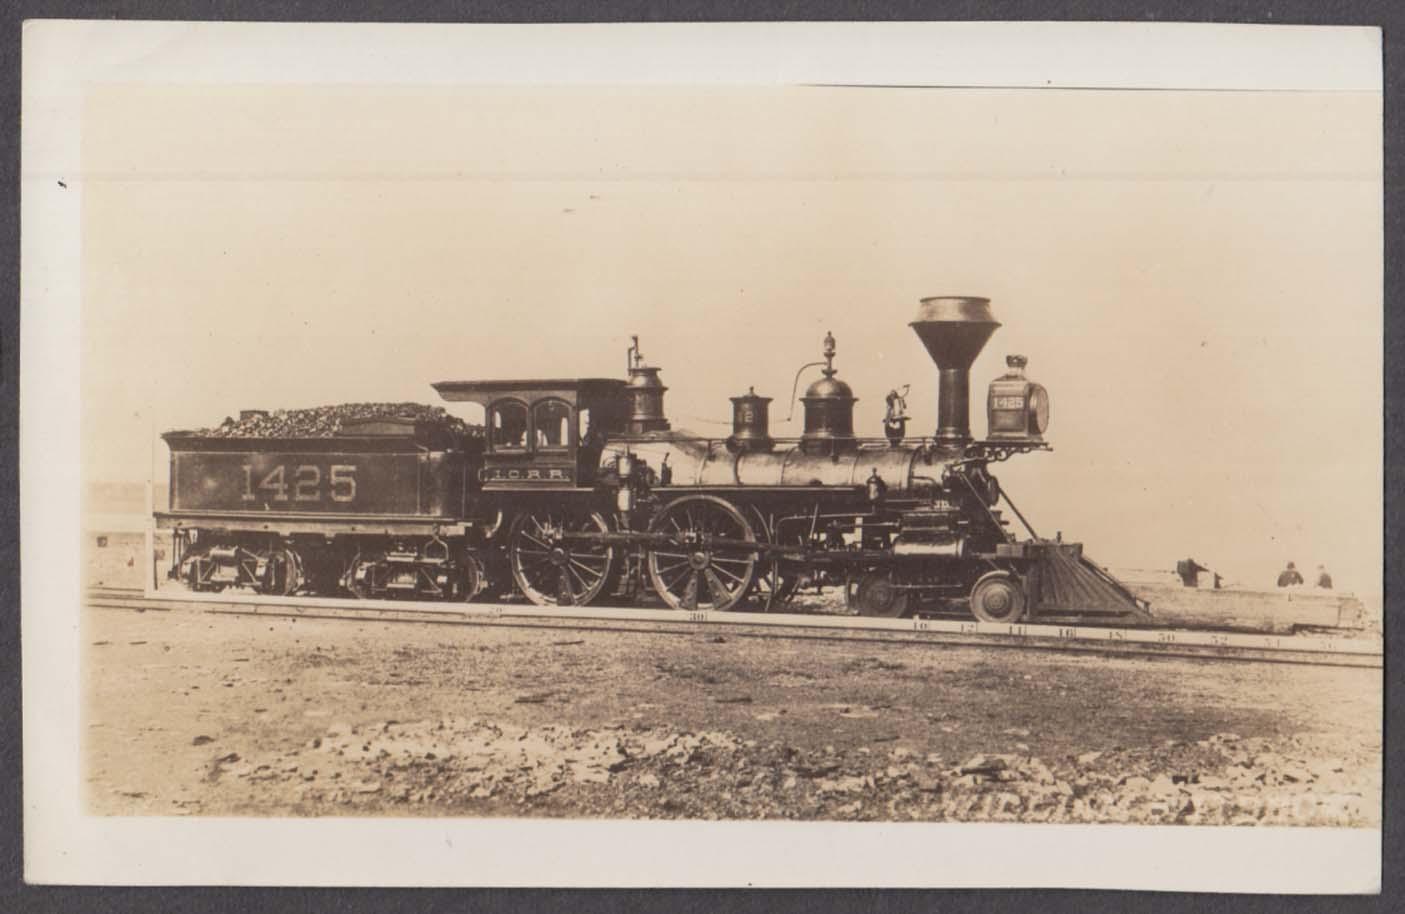 .Illinois Central RR 8-wheeler steam locomotive 4-4-0 #1425 photo